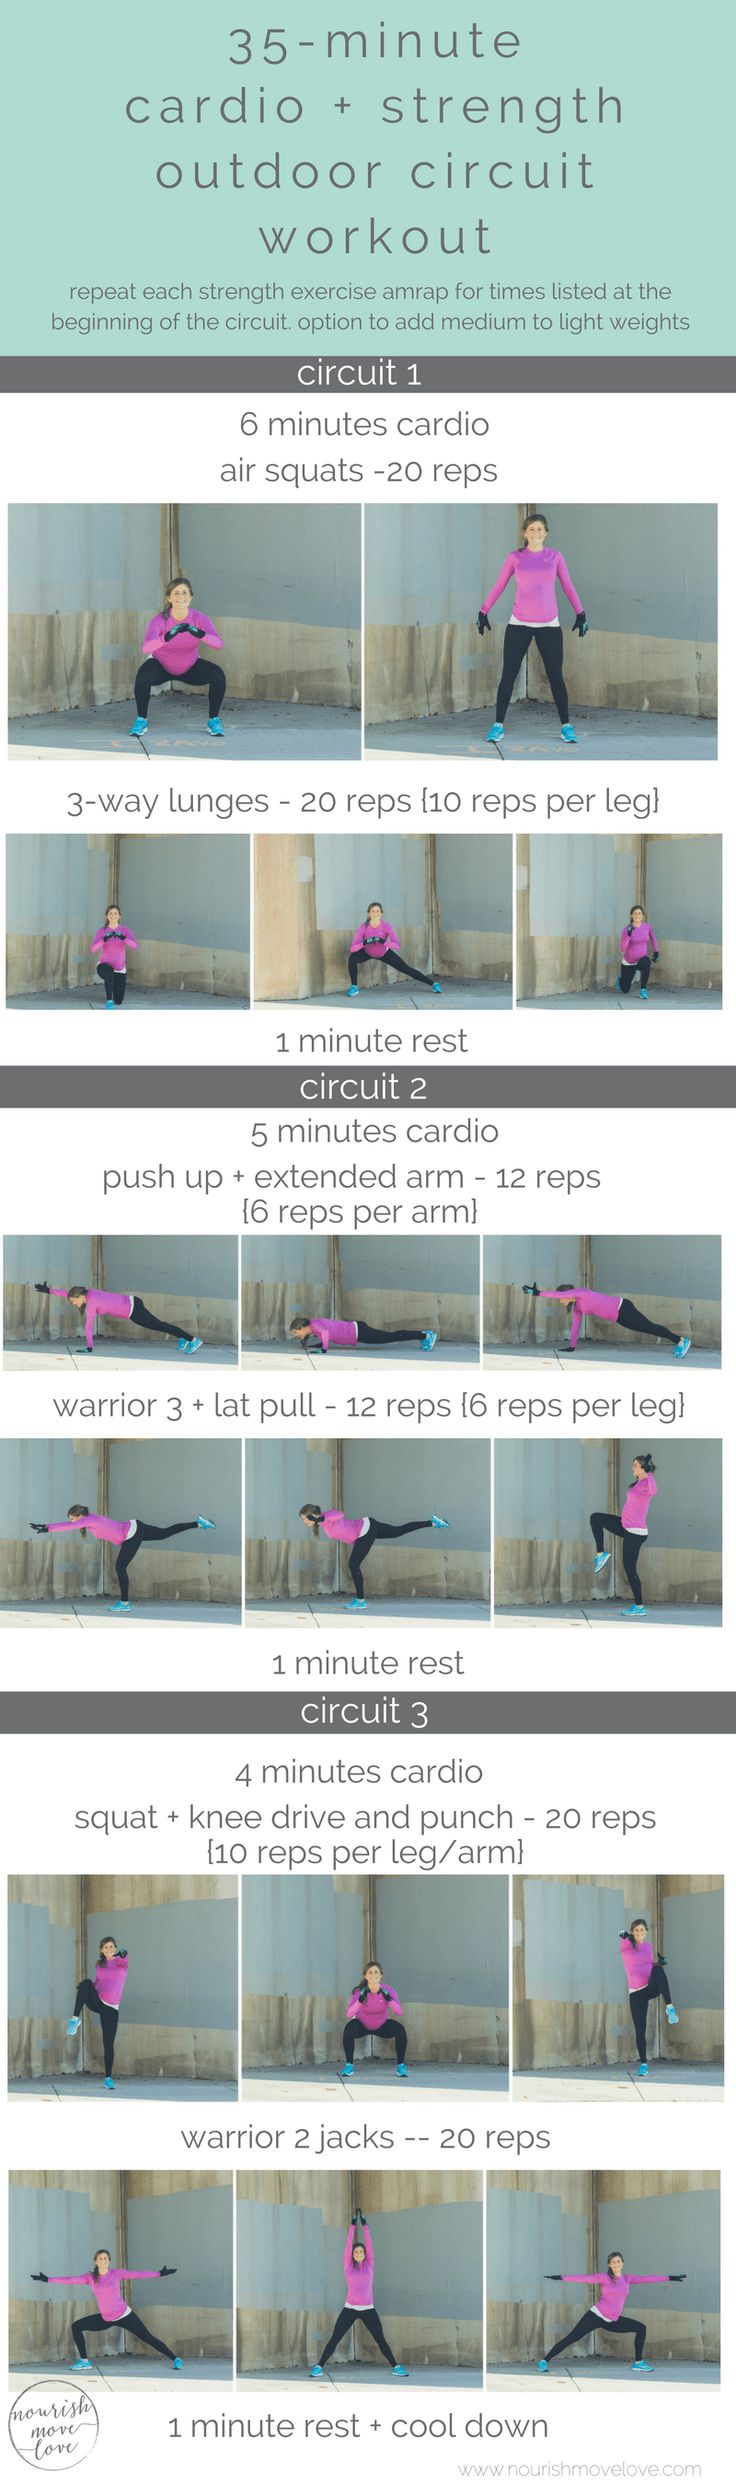 outdoor 35-minute cardio and strength circuit workout   nourishmovelove.com